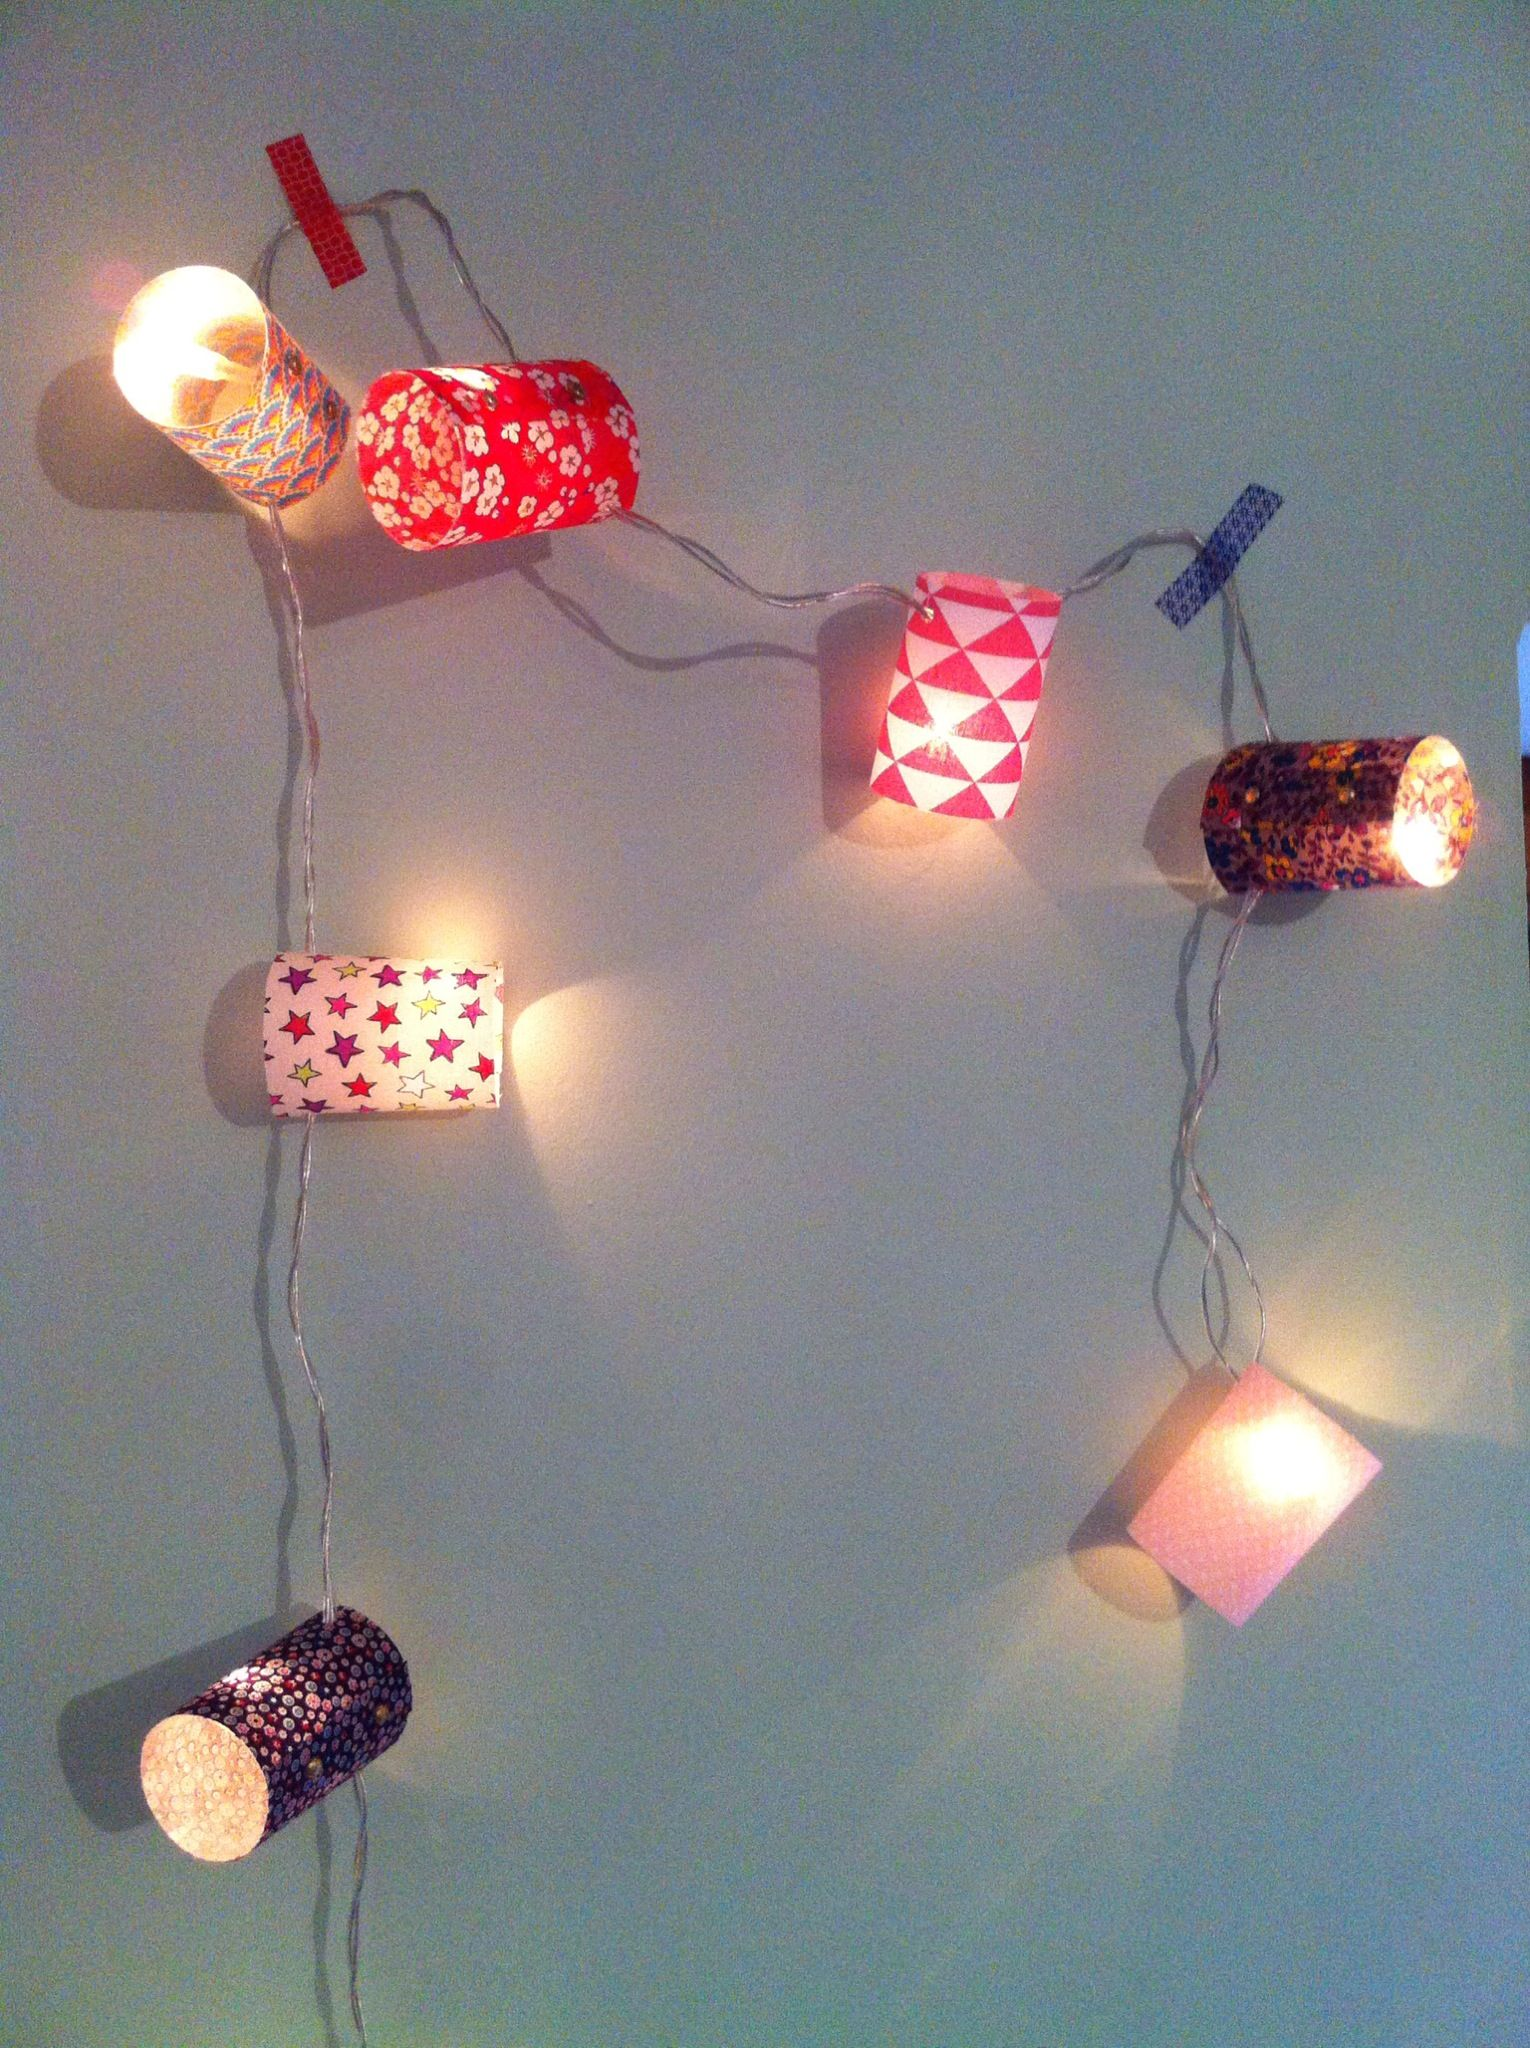 DIY : la guirlande colorée en tissus | Tuto couture | Pinterest ...